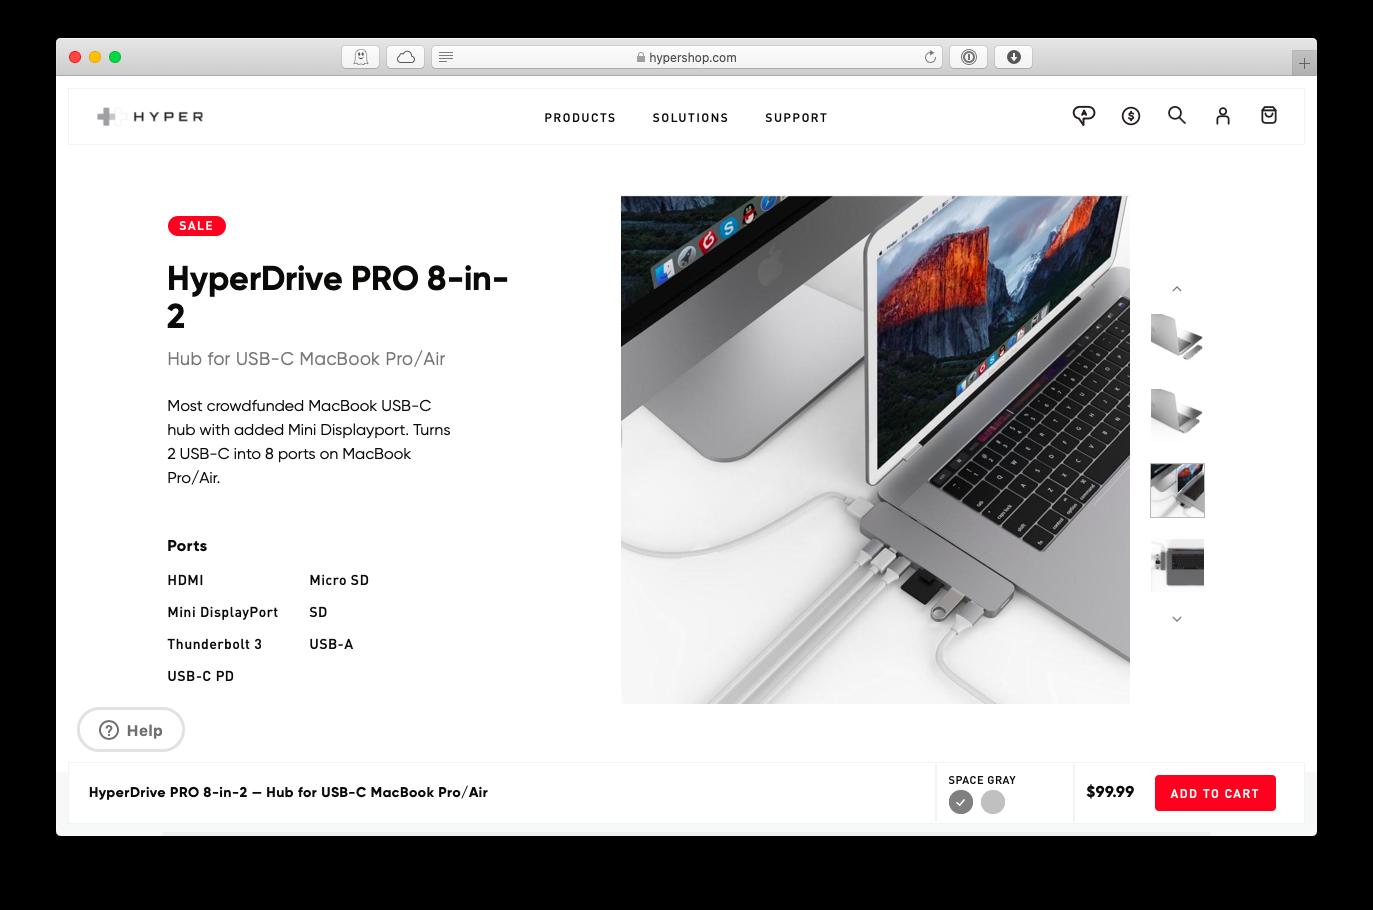 HyperDrive PRO USB-C hub